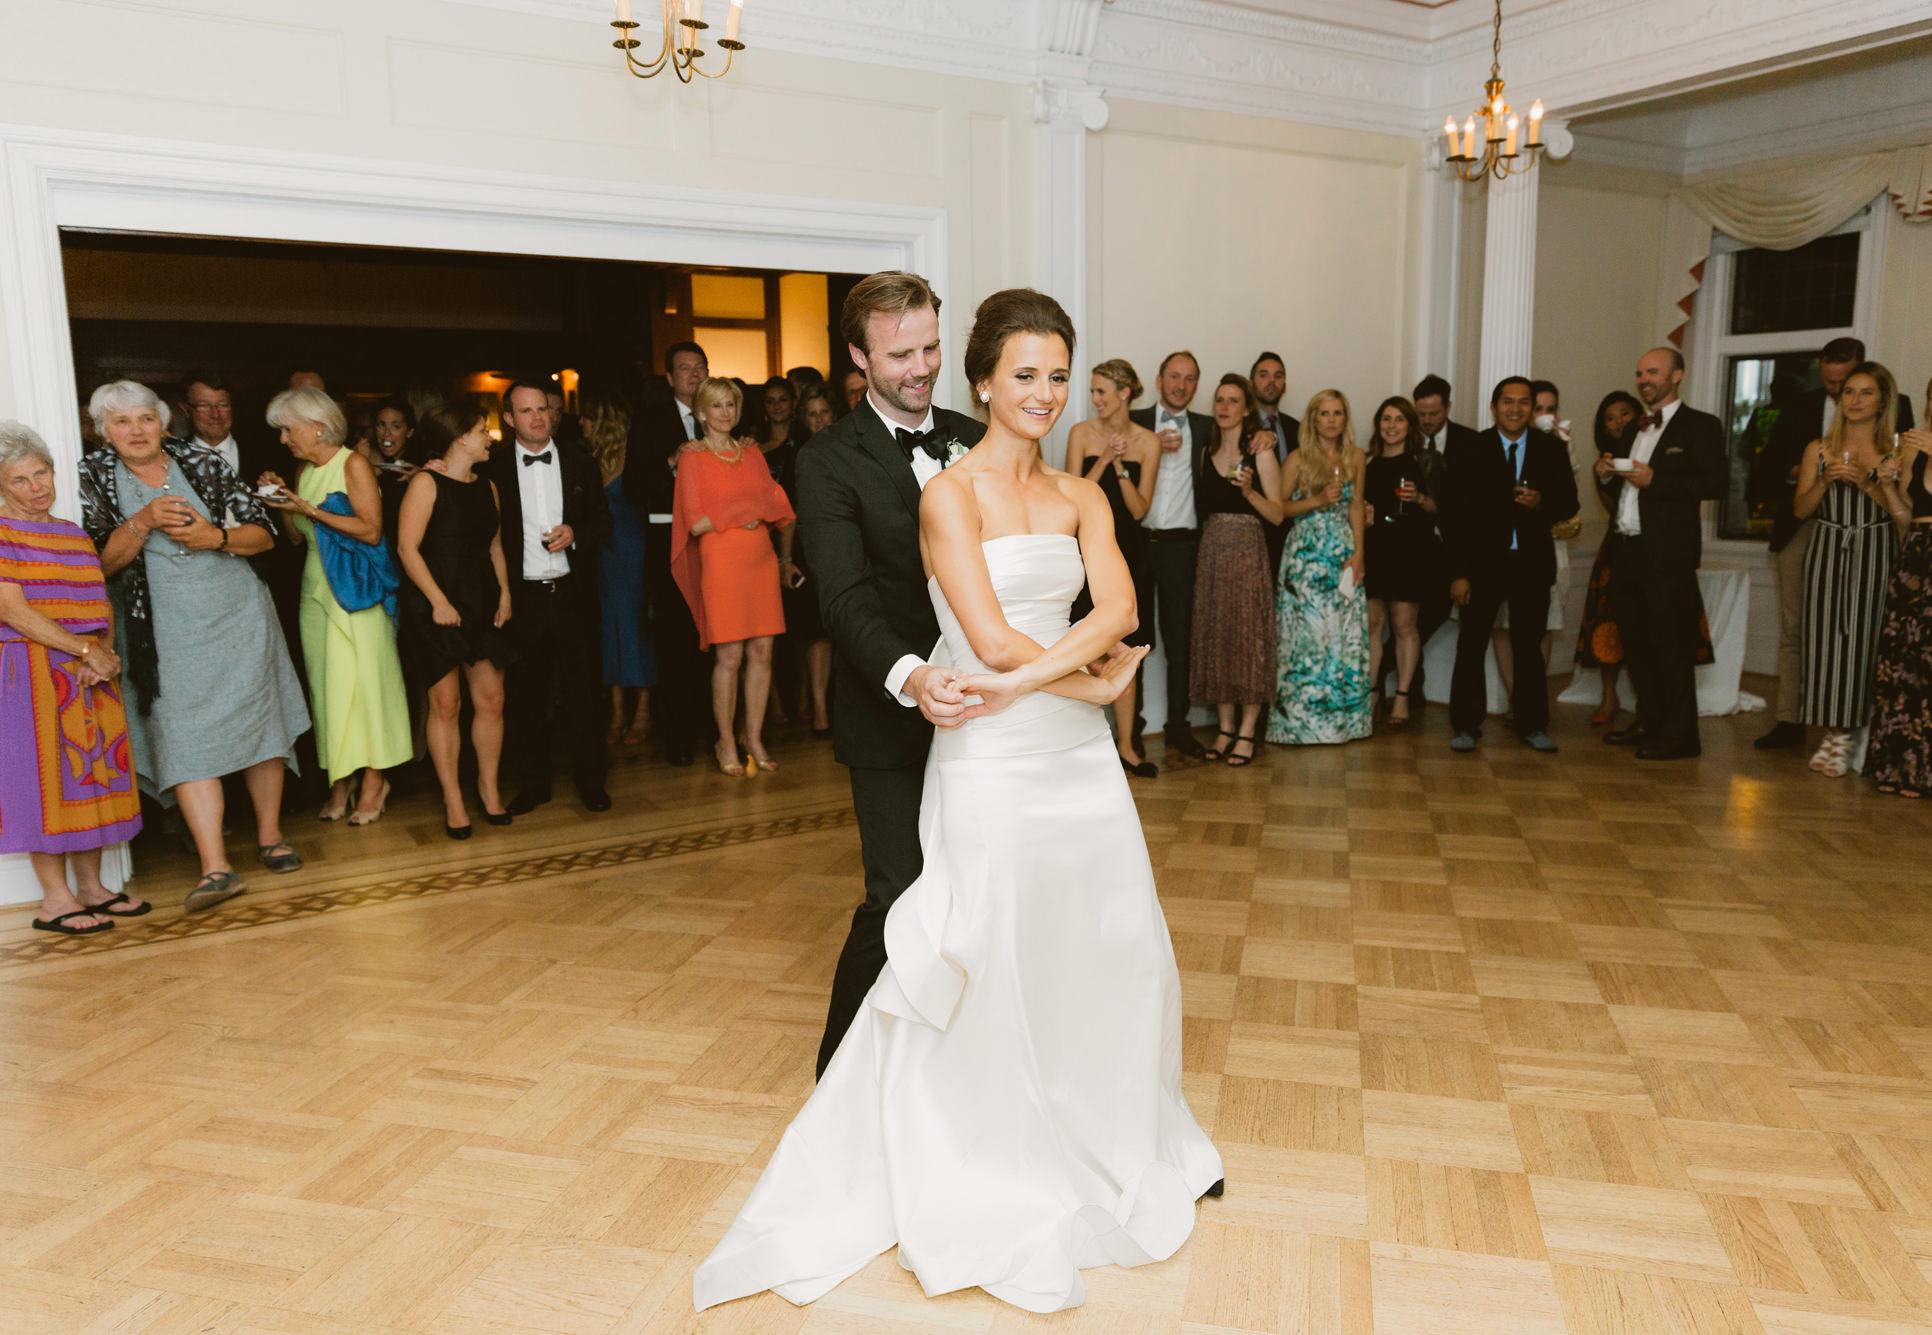 Cecil Green Park House Wedding - Vancouver BC Canada Camilla Anchisi Photography   Italian Destination Wedding